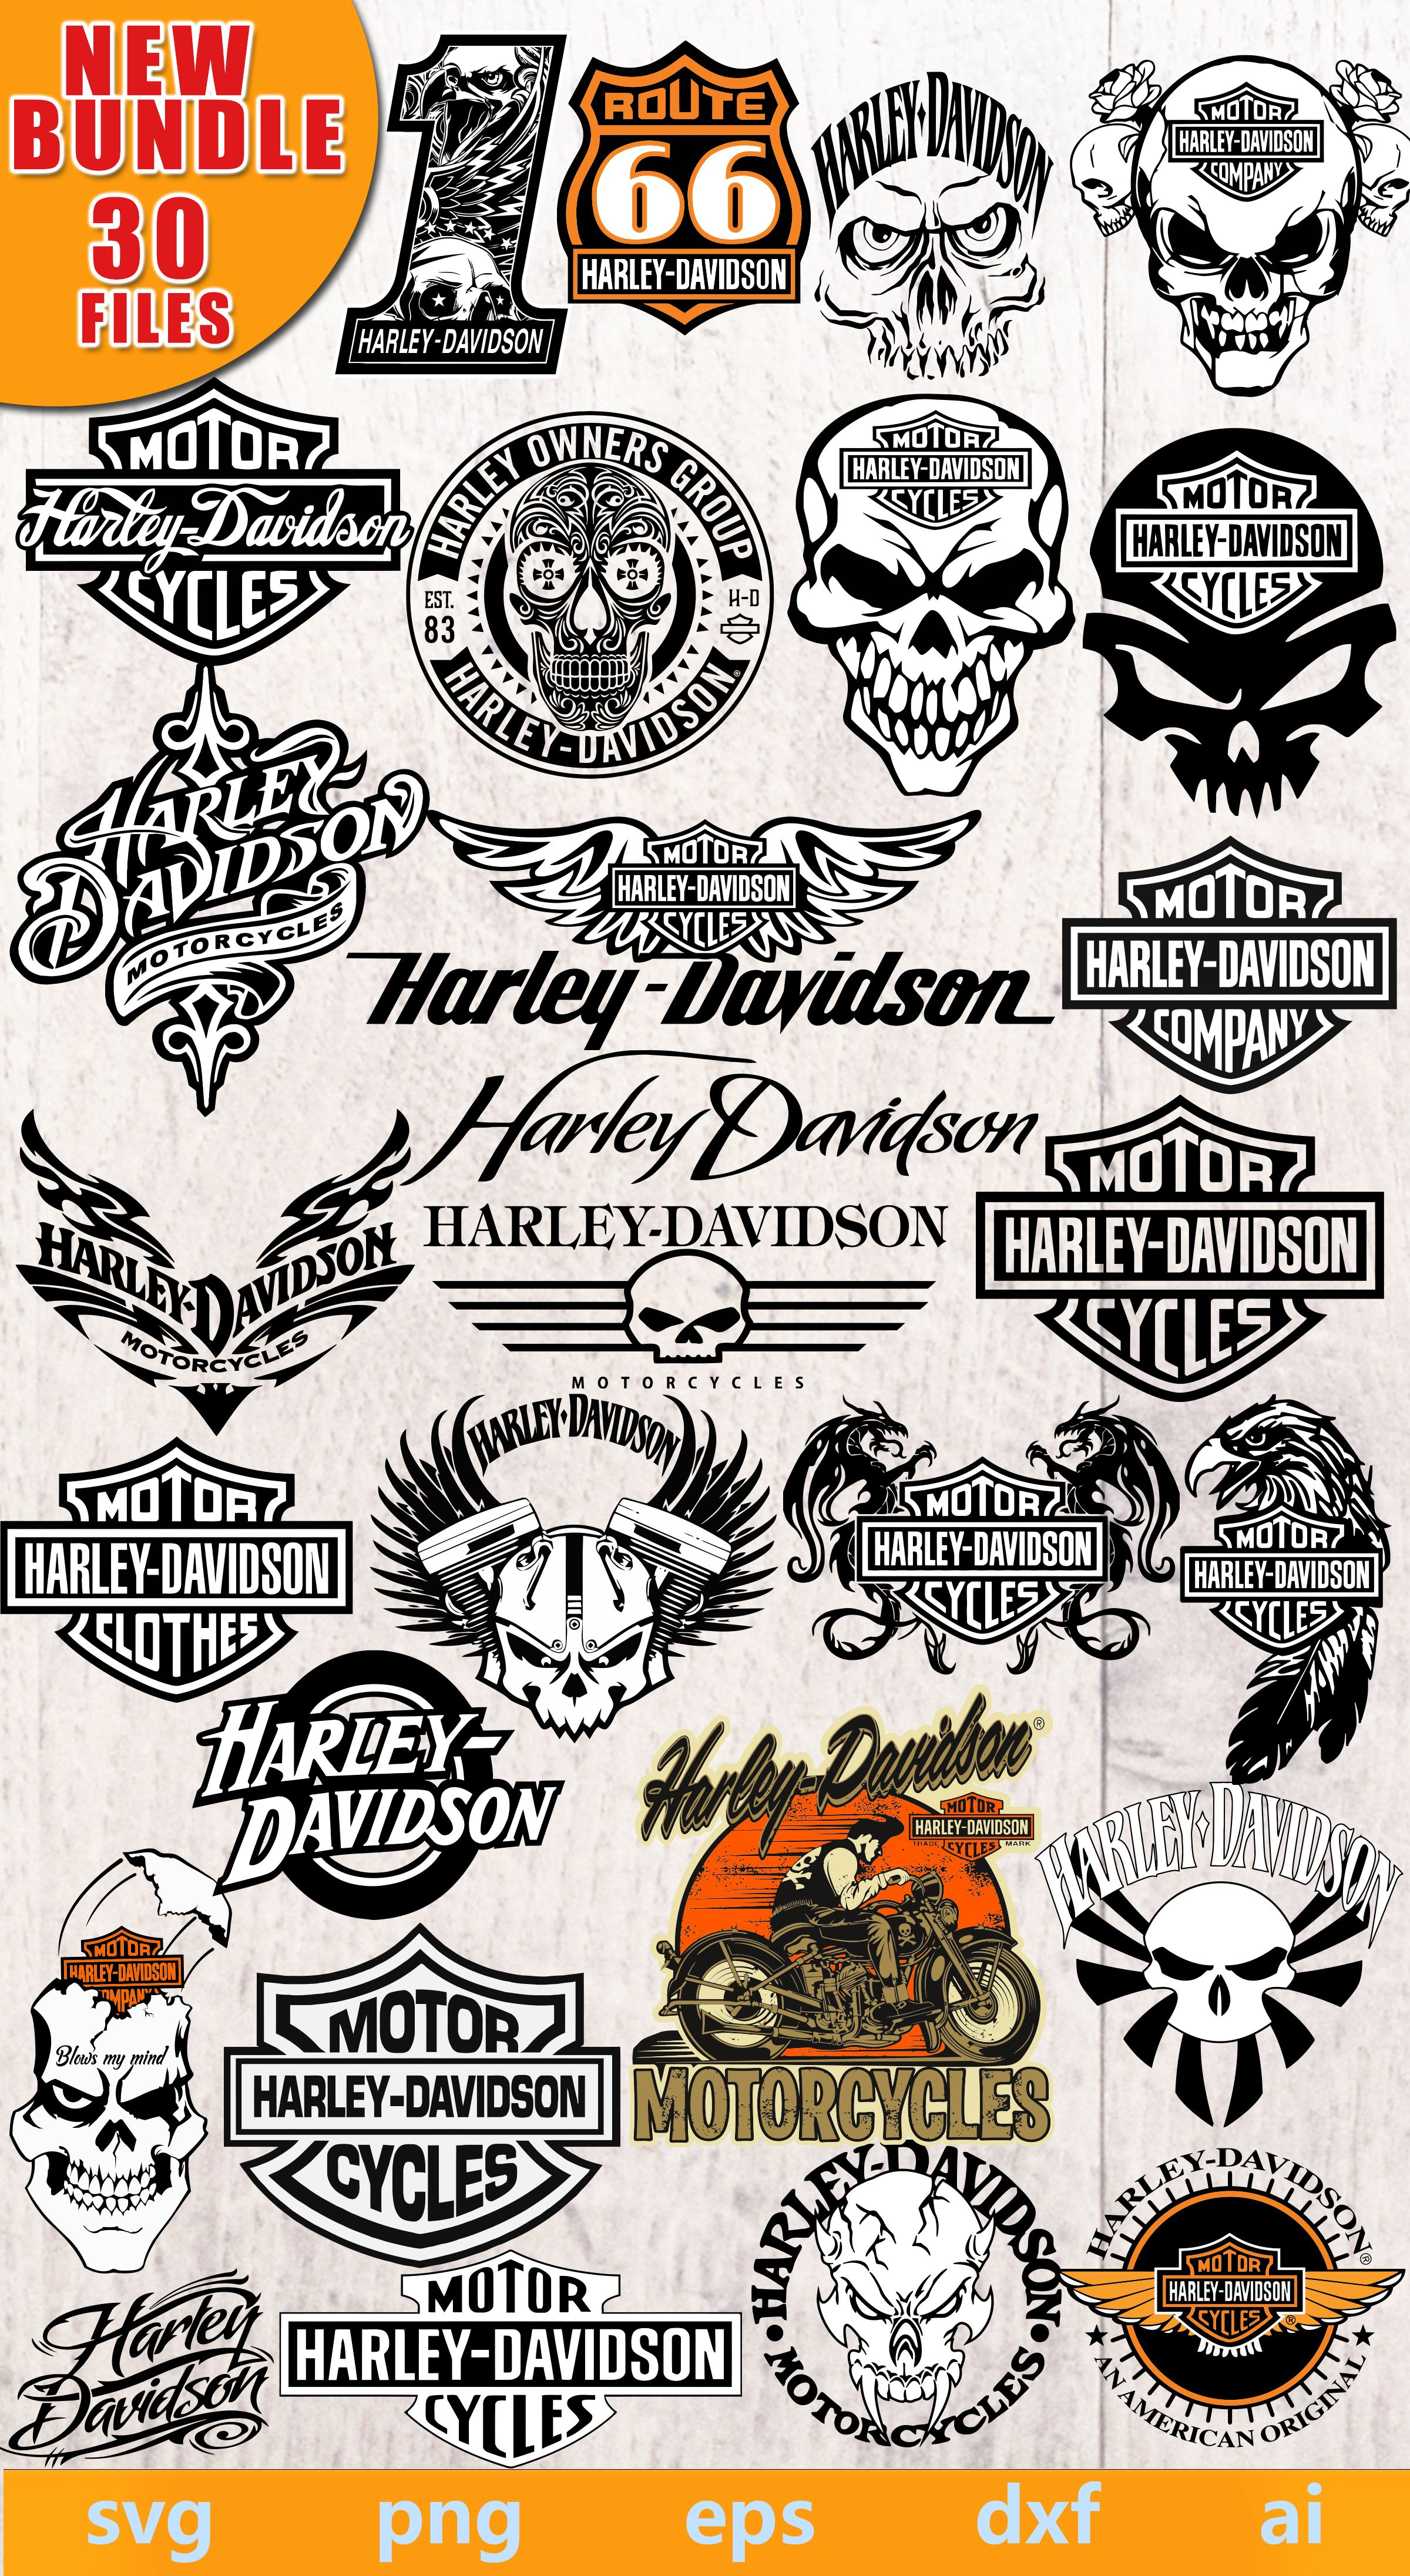 Harley Davidson Svg Harley Davidson Logo Harley Davidson Png Harley Davidson Eps Harley Davidson Dxf Harley Davidson Silhouette In 2020 Harley Davidson Signs Harley Davidson Logo Stencils Printables